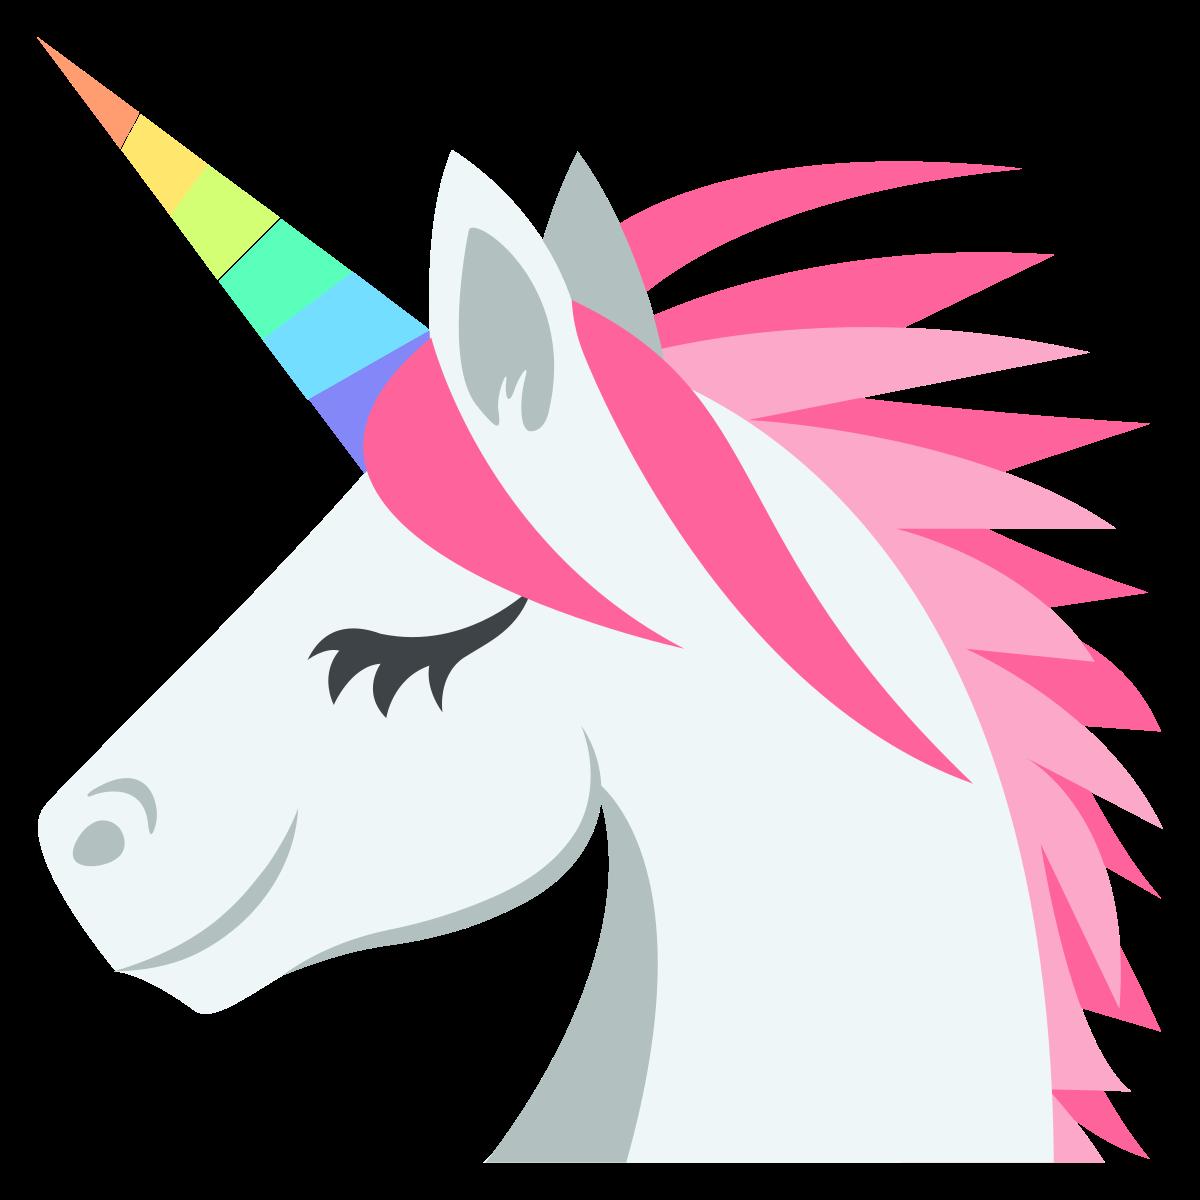 Rainbows and unicorns wiktionary. Wing clipart unicorn